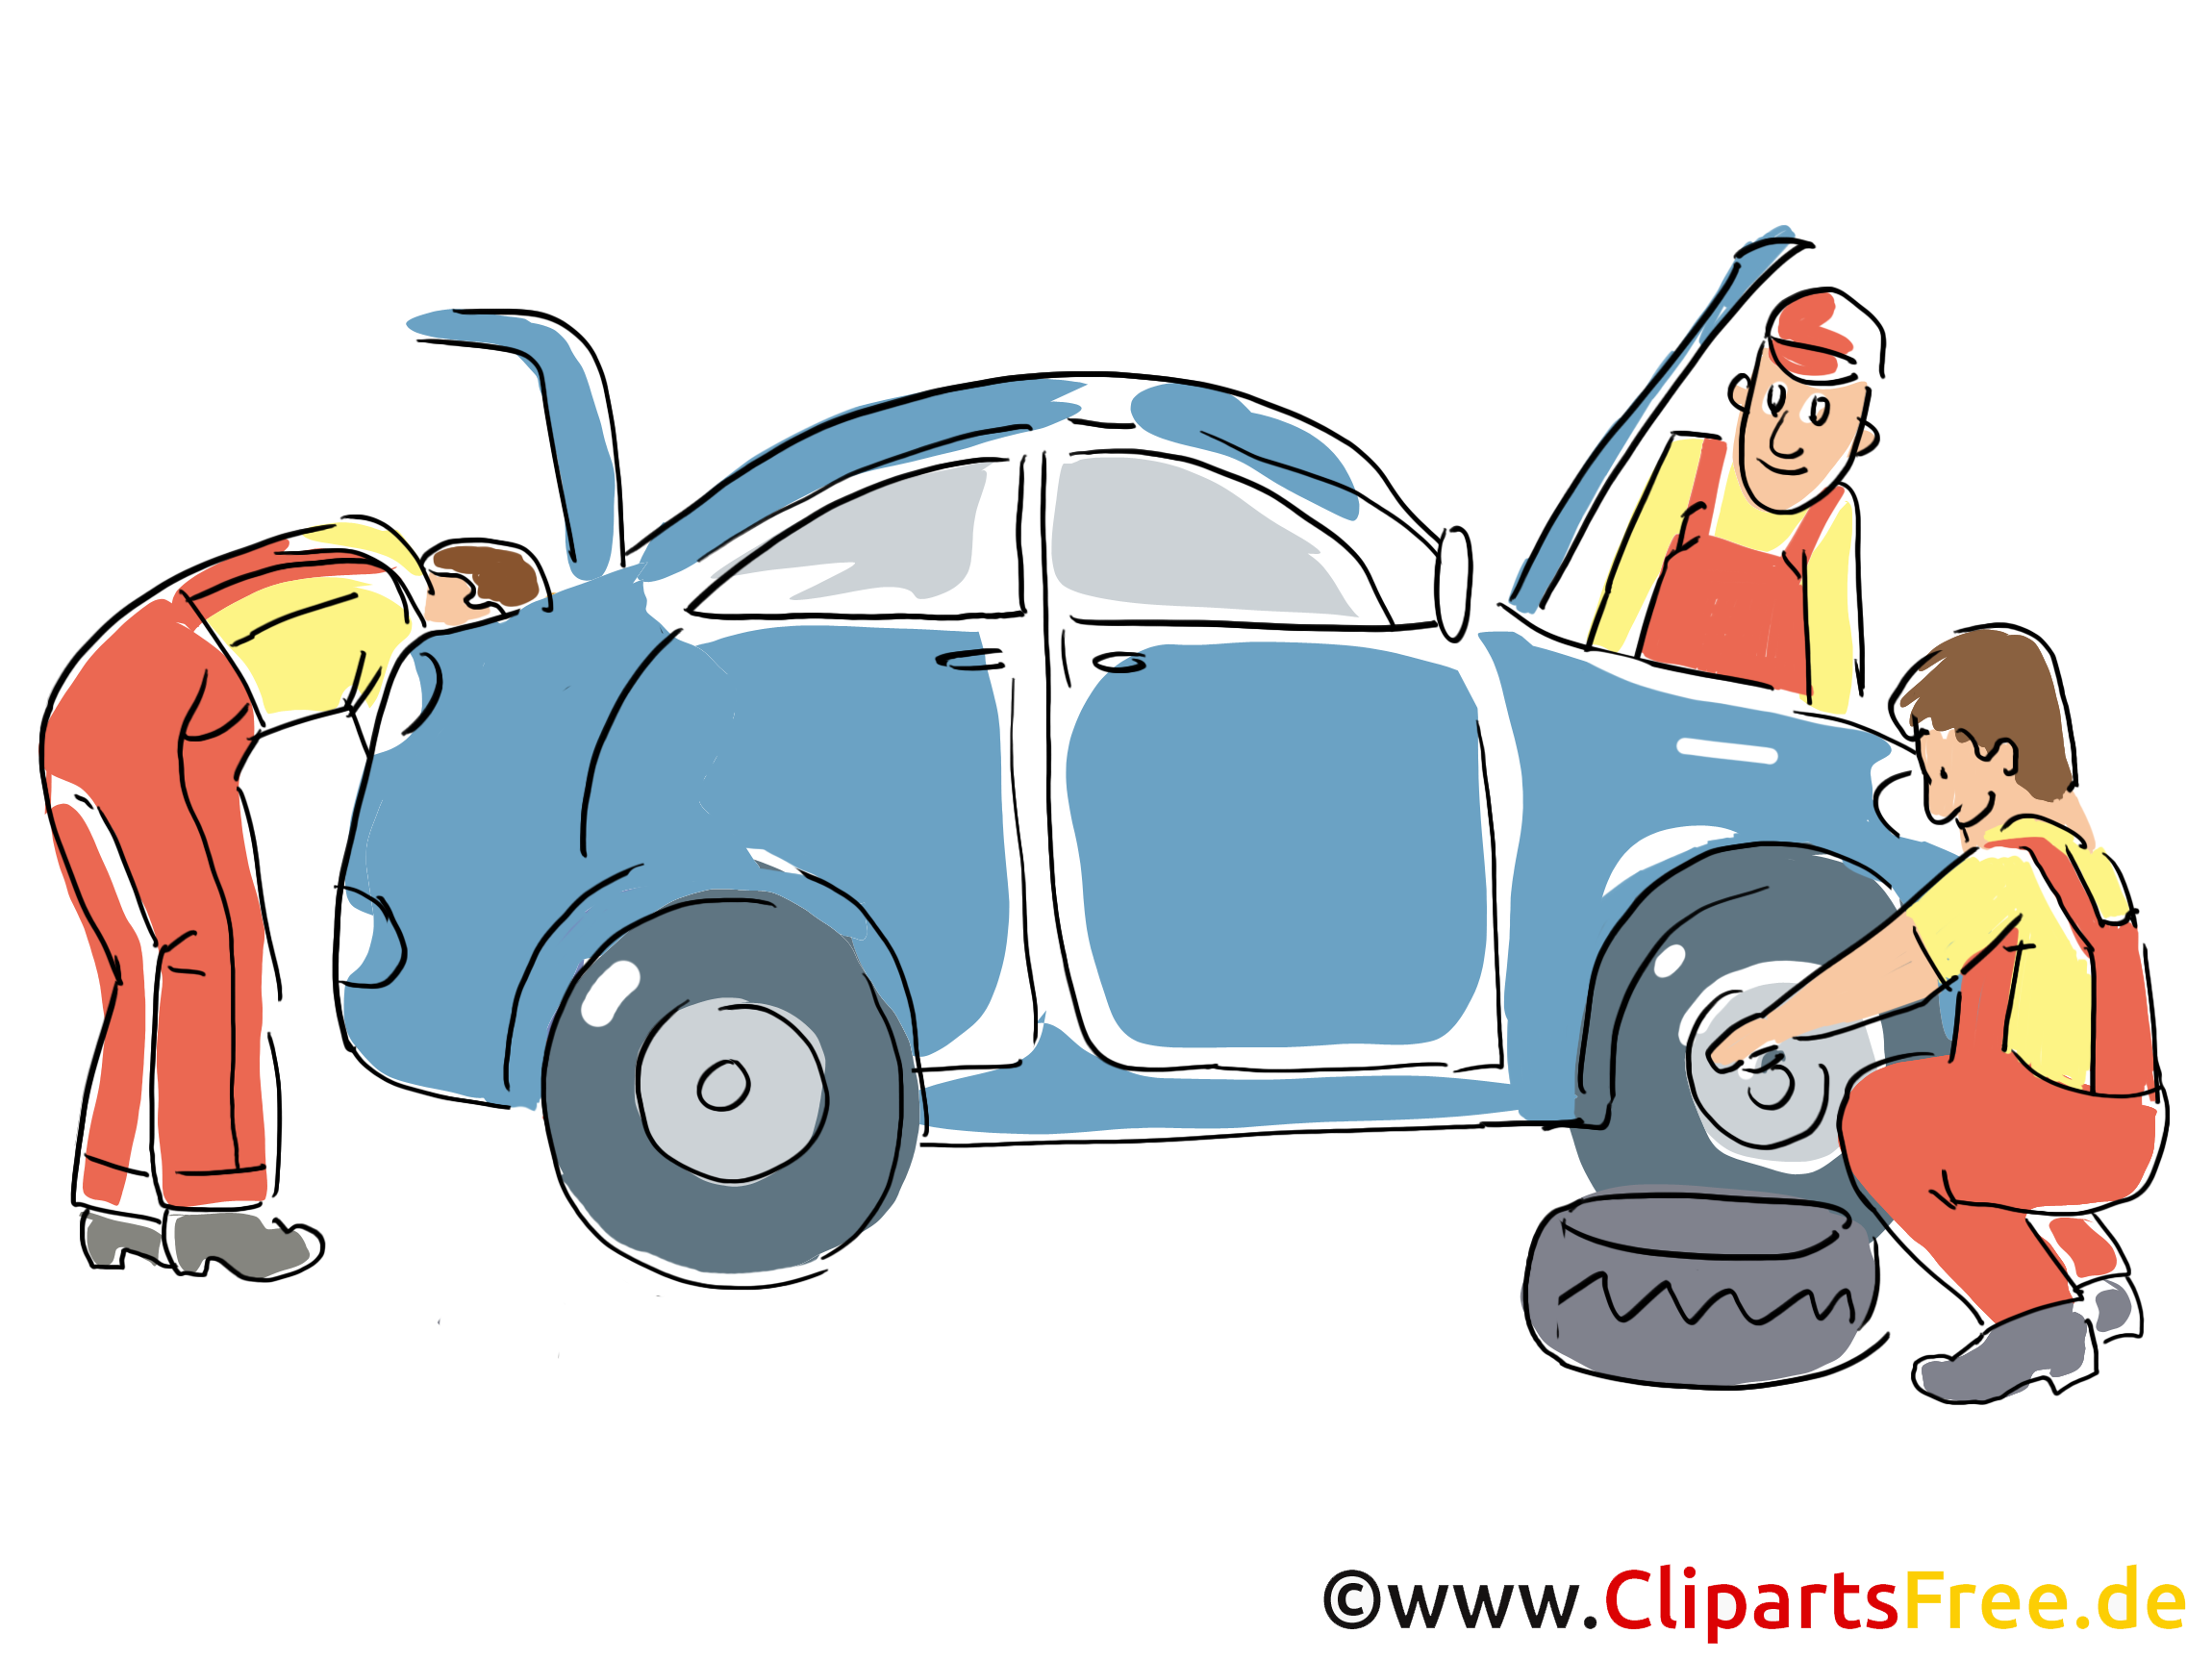 Autoservice, Inspektion Clipart, Bild, Grafik, Cartoon, Illustration gratis